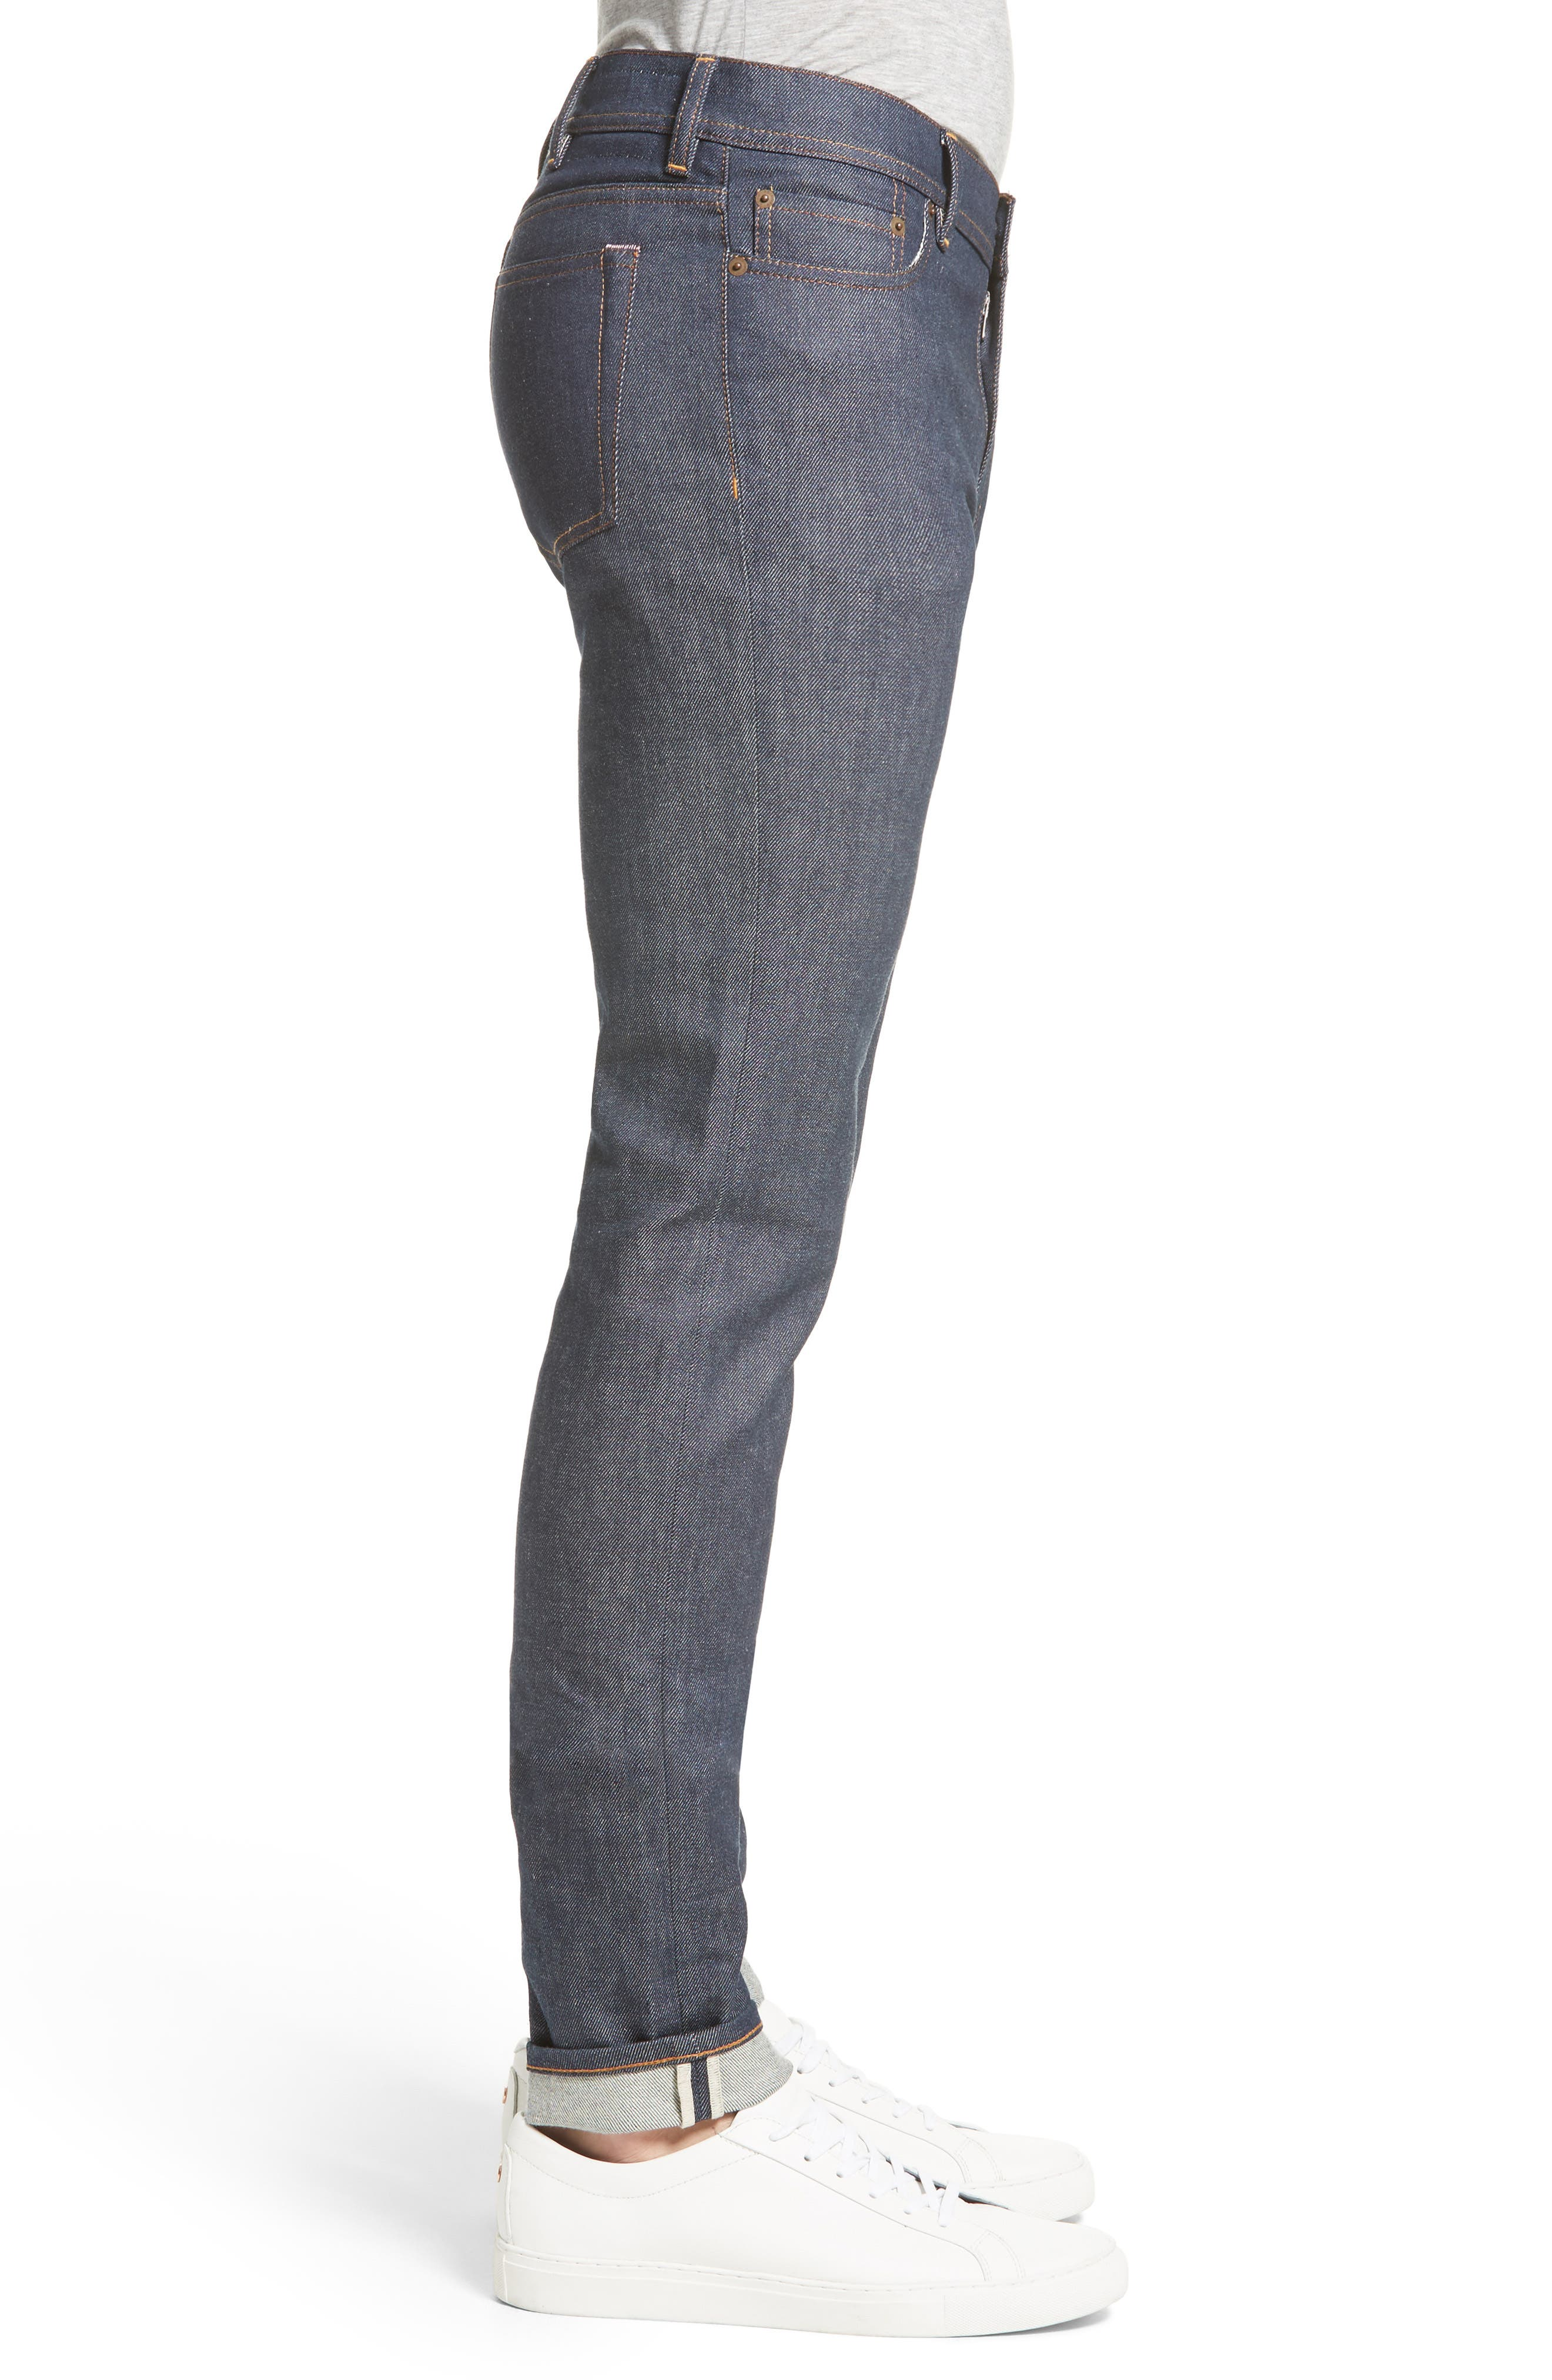 North Skinny Jeans,                             Alternate thumbnail 3, color,                             INDIGO